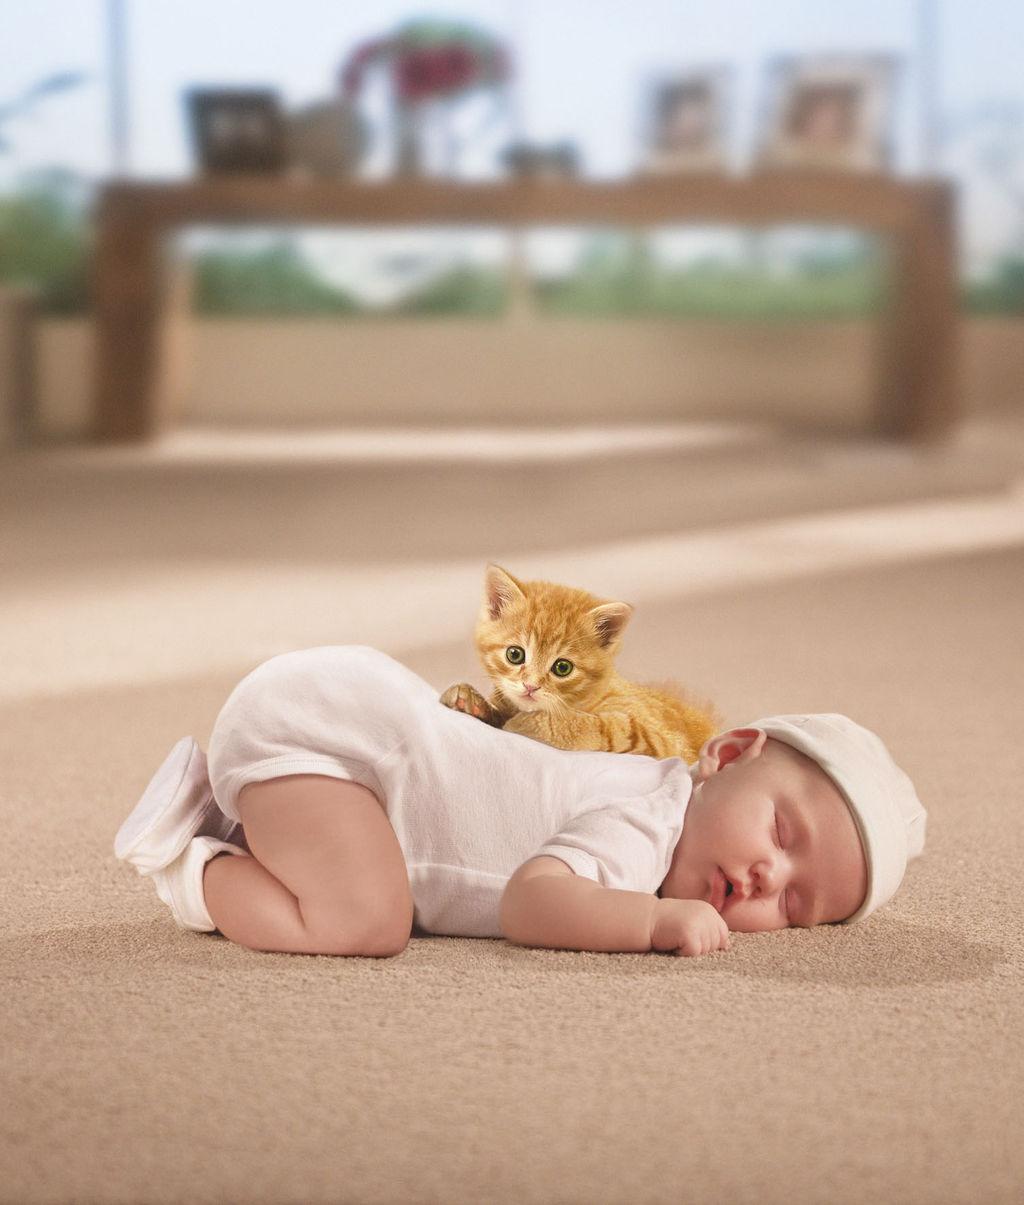 Baby-and-kitten-on-c9C8F06